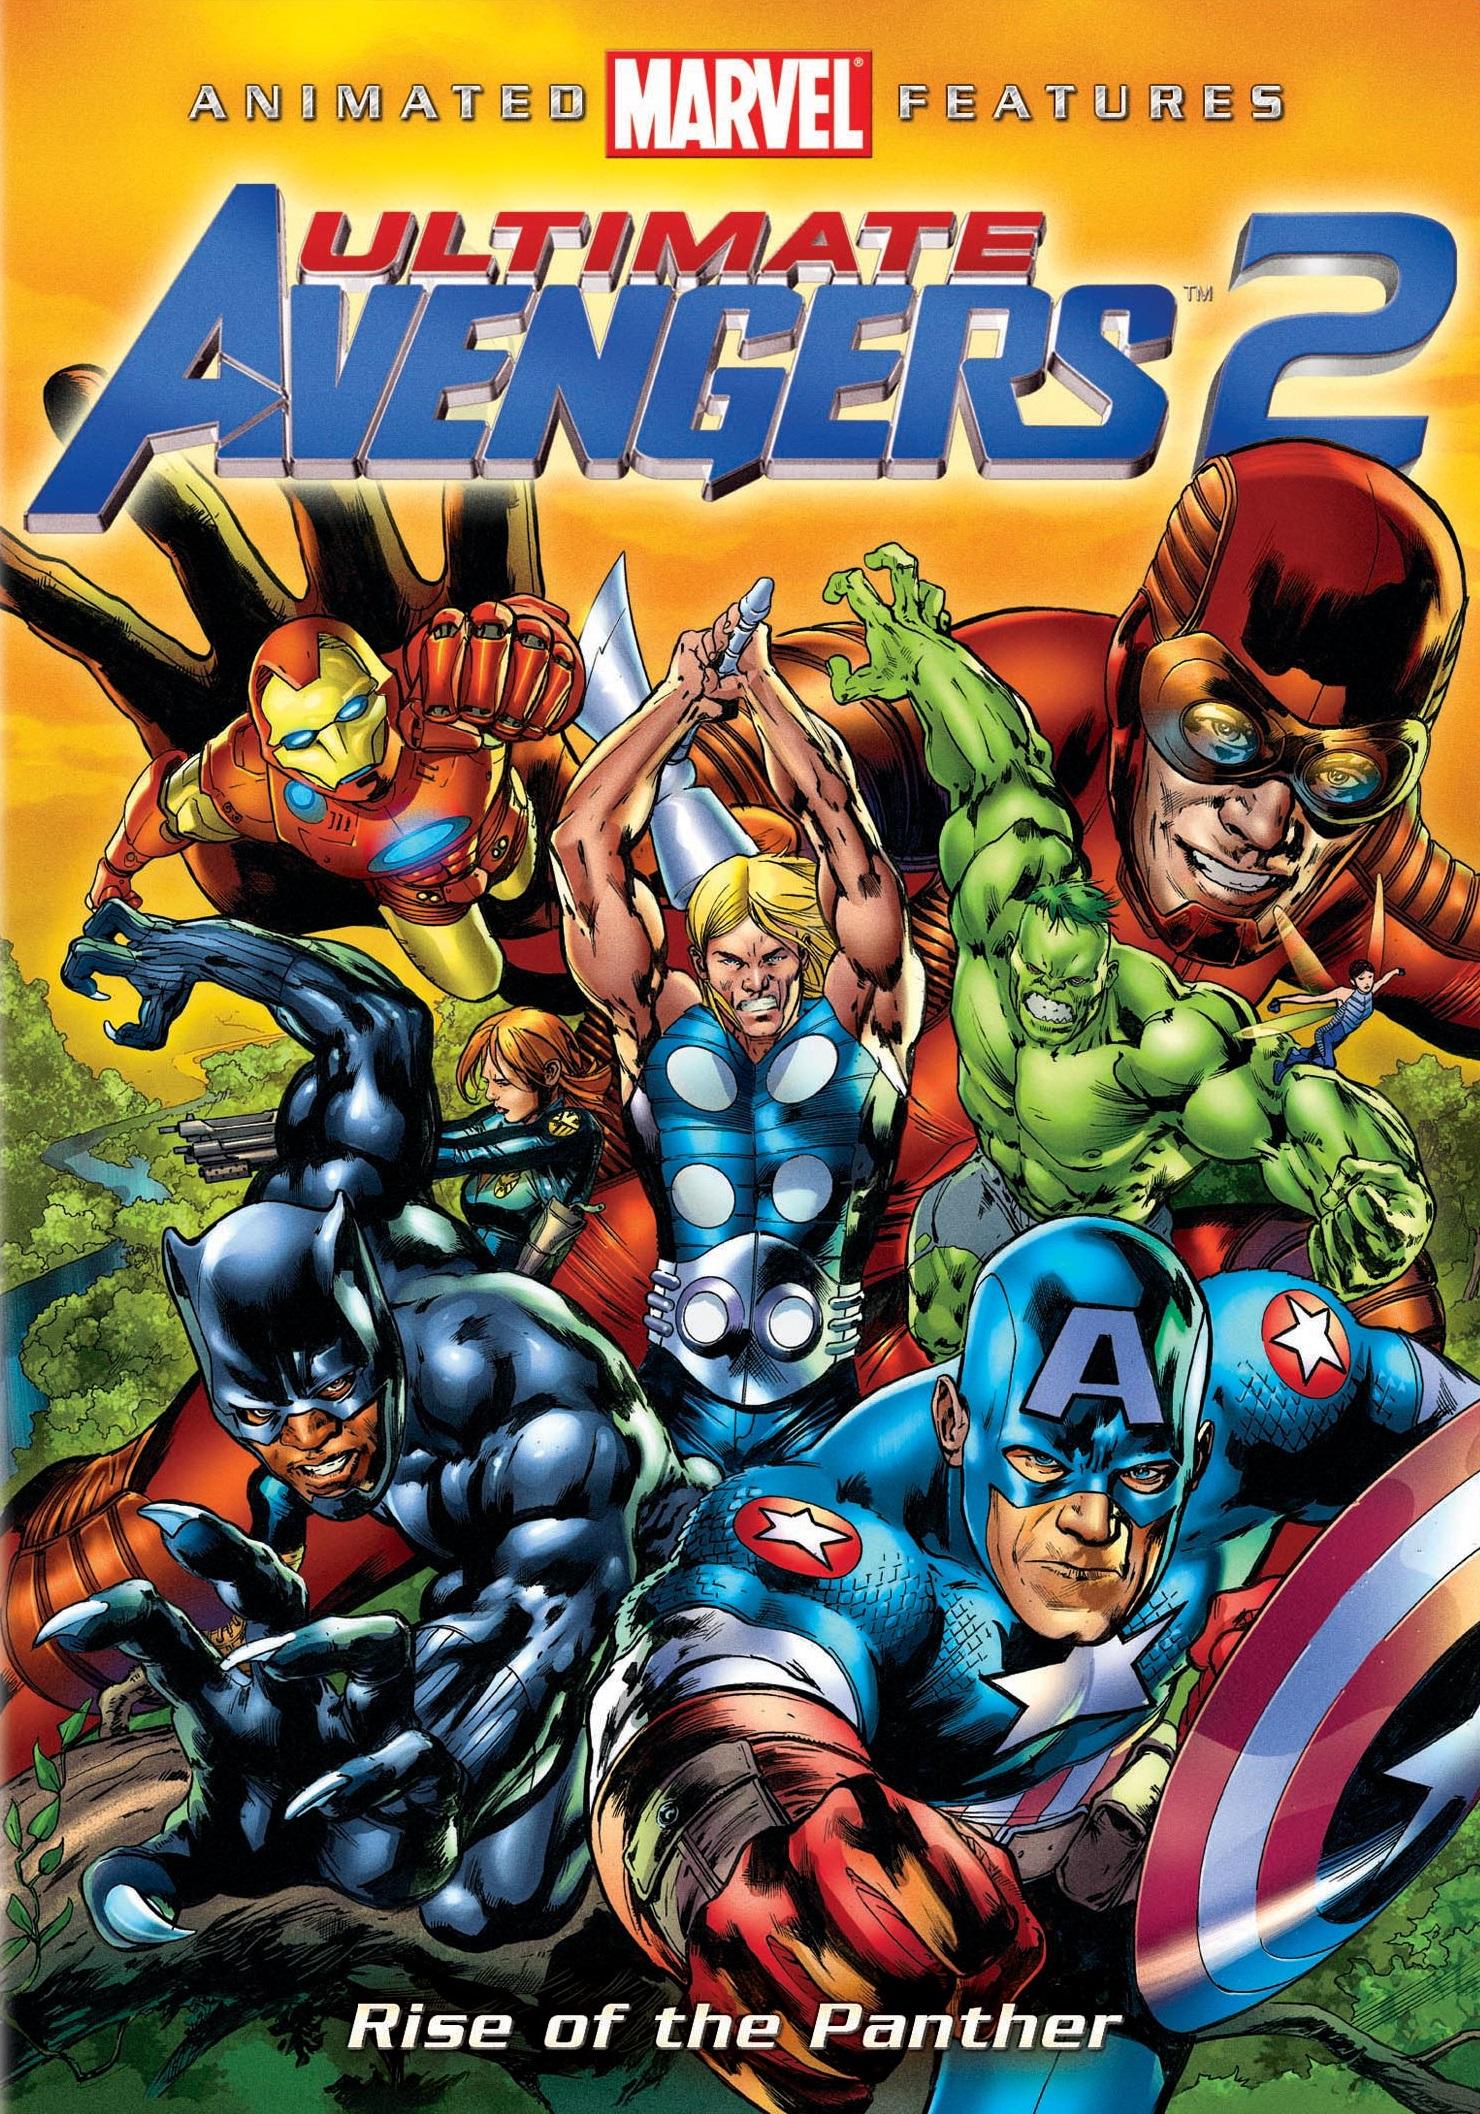 The Ultimate Avengers 2: Los Vengadores 2